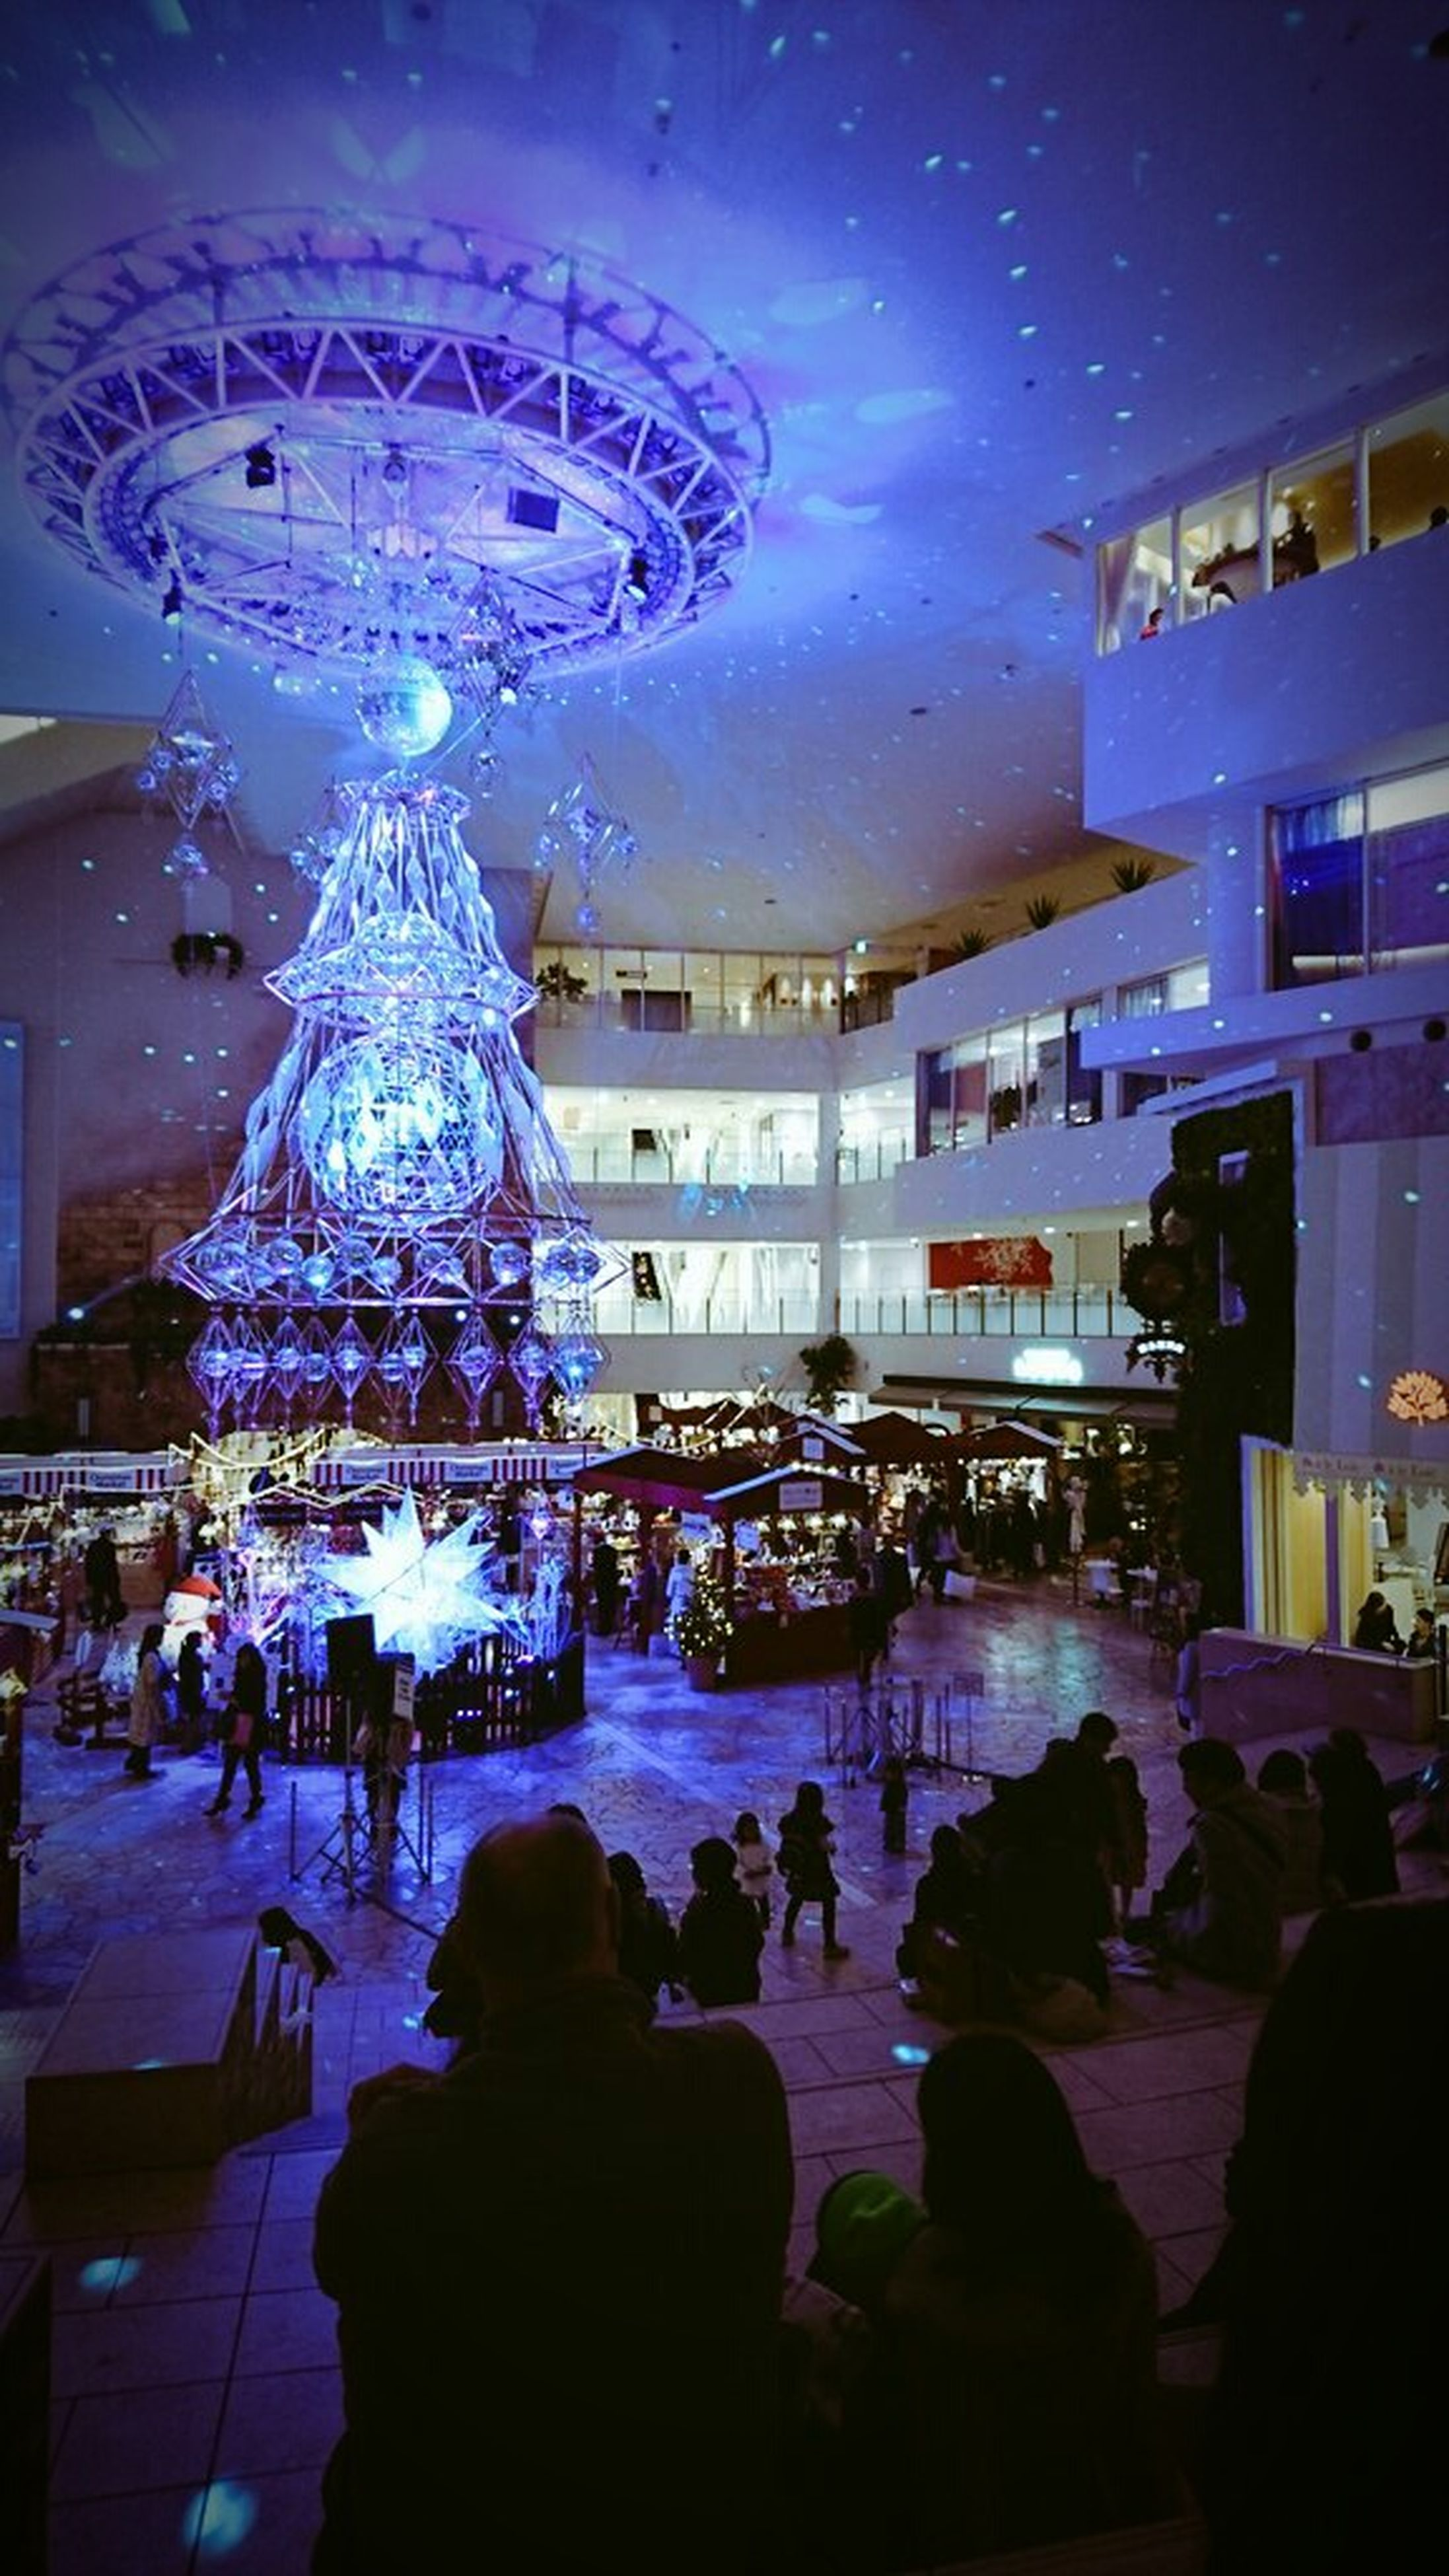 night, christmas tree, christmas, sky, christmas lights, christmas decoration, people, architecture, outdoors, star - space